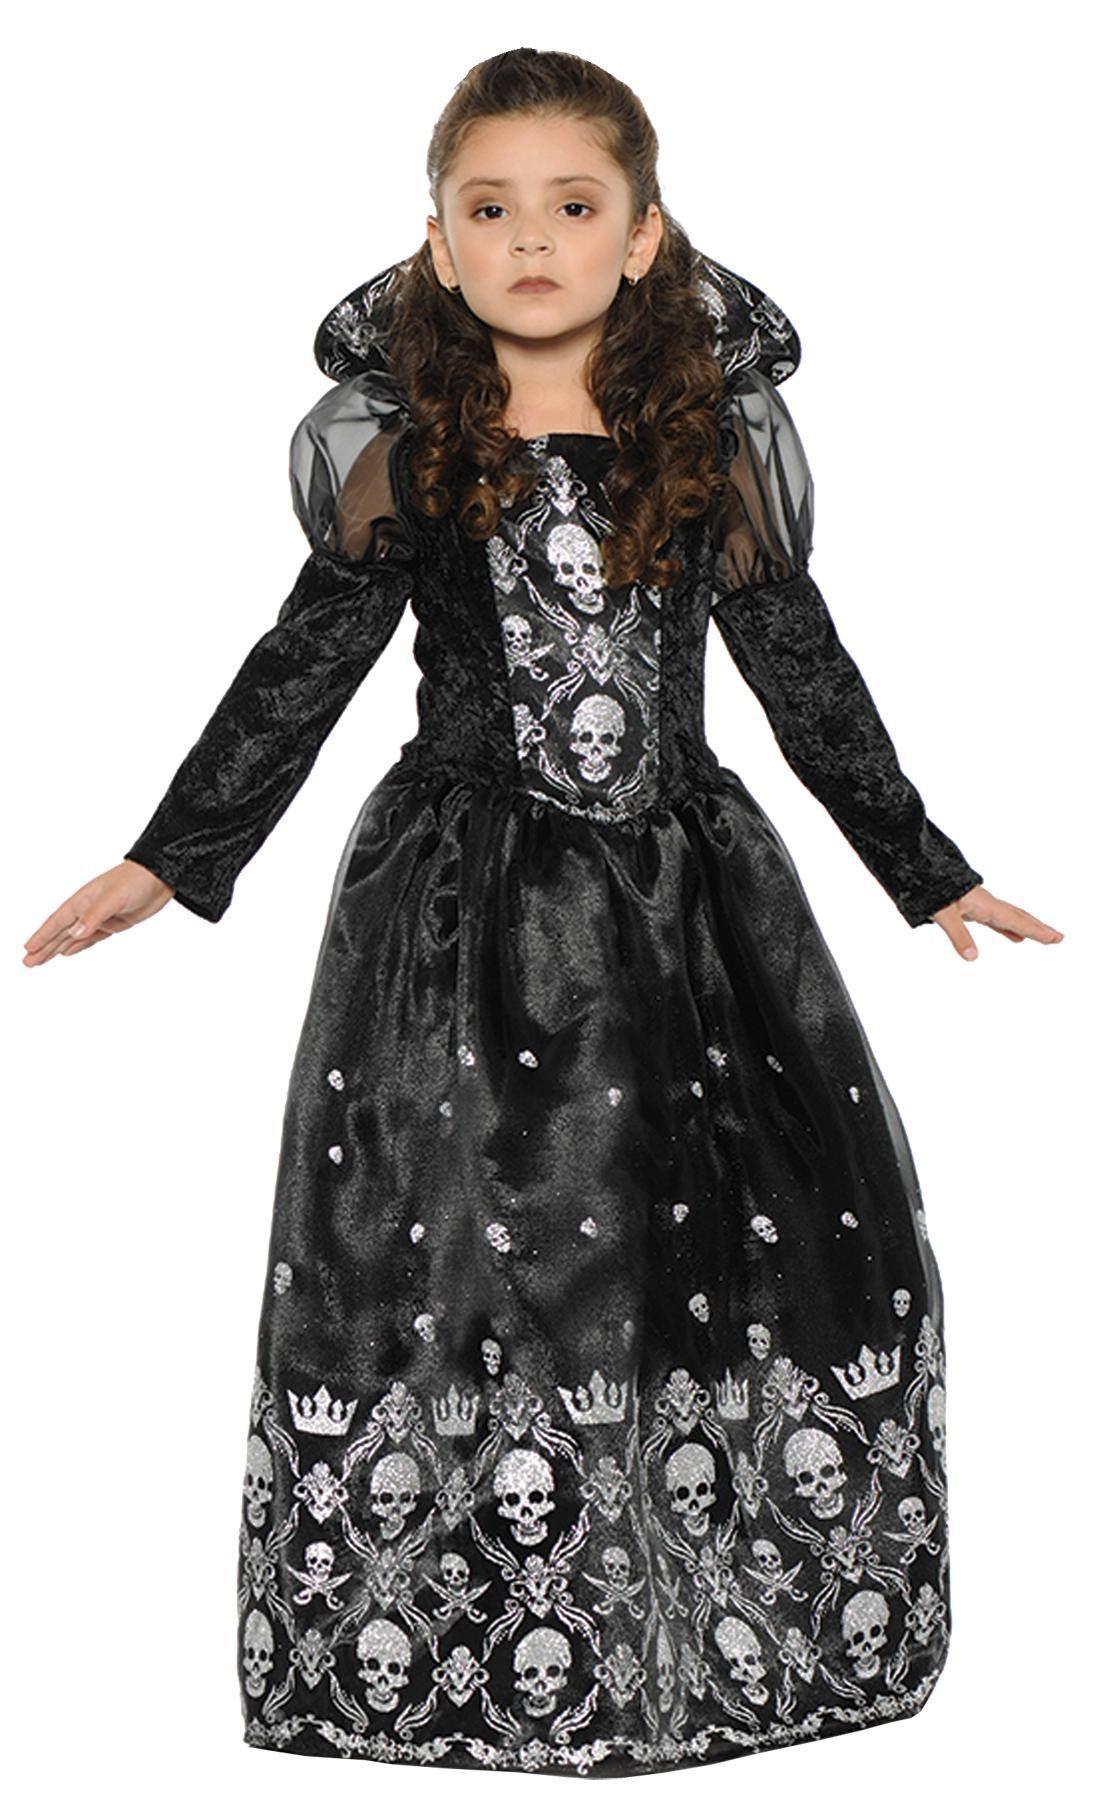 Dark Princess Child Large Halloween costumes for girls